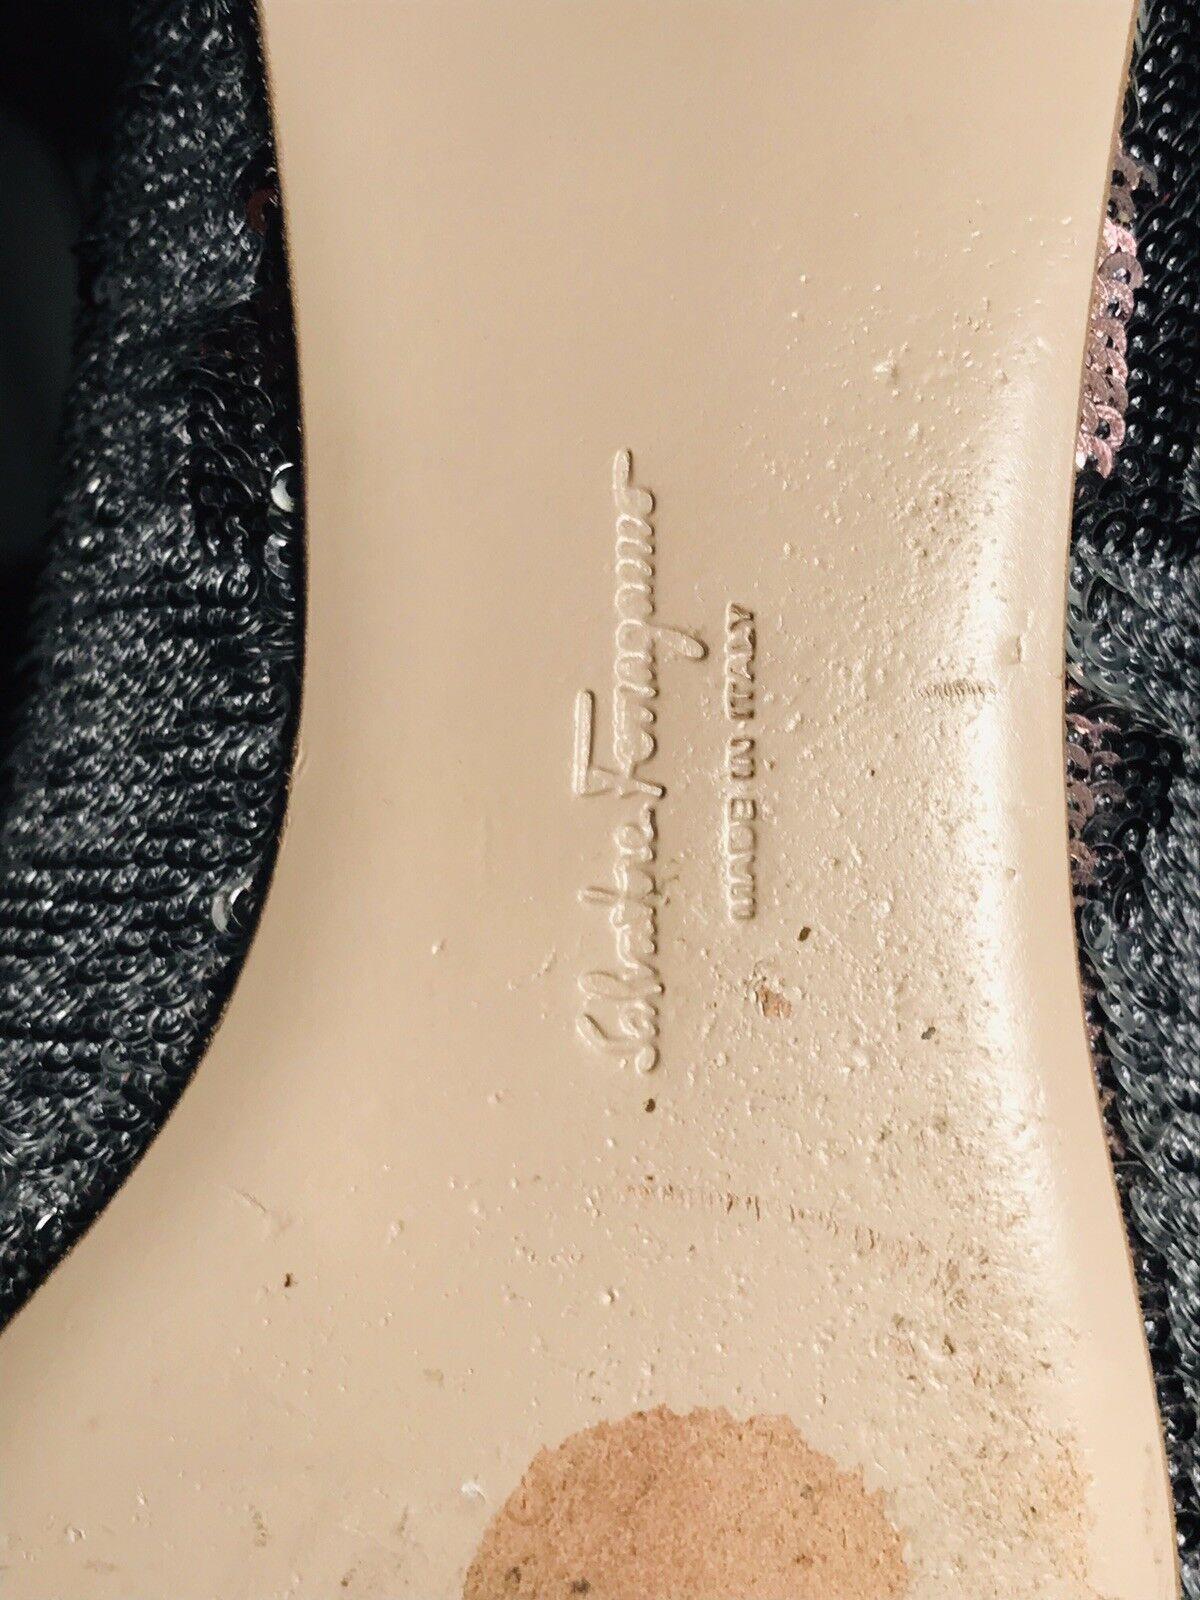 SALVATORE FERRAGAMO FERRAGAMO FERRAGAMO Mermaid Silver Bronze Sequin Flats 9.5 Retail  625 2b42bc